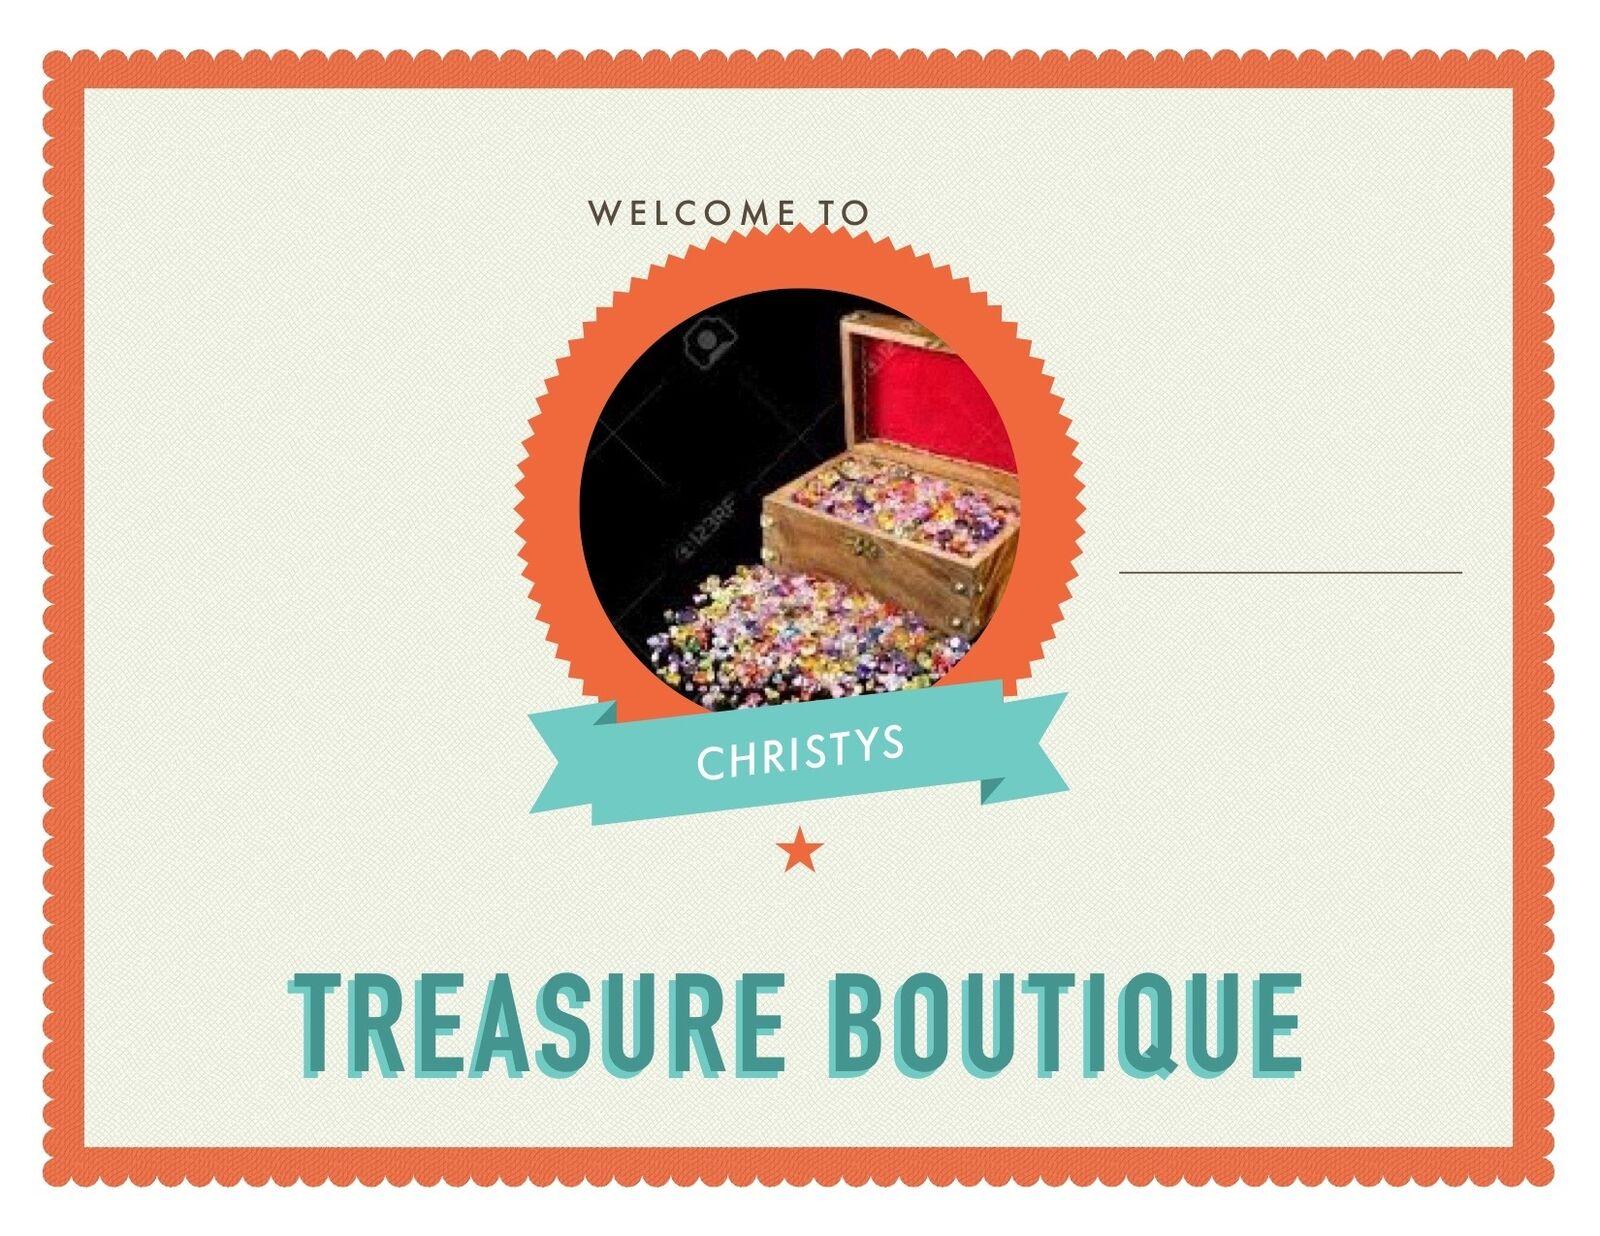 Christy's Treasure Boutique